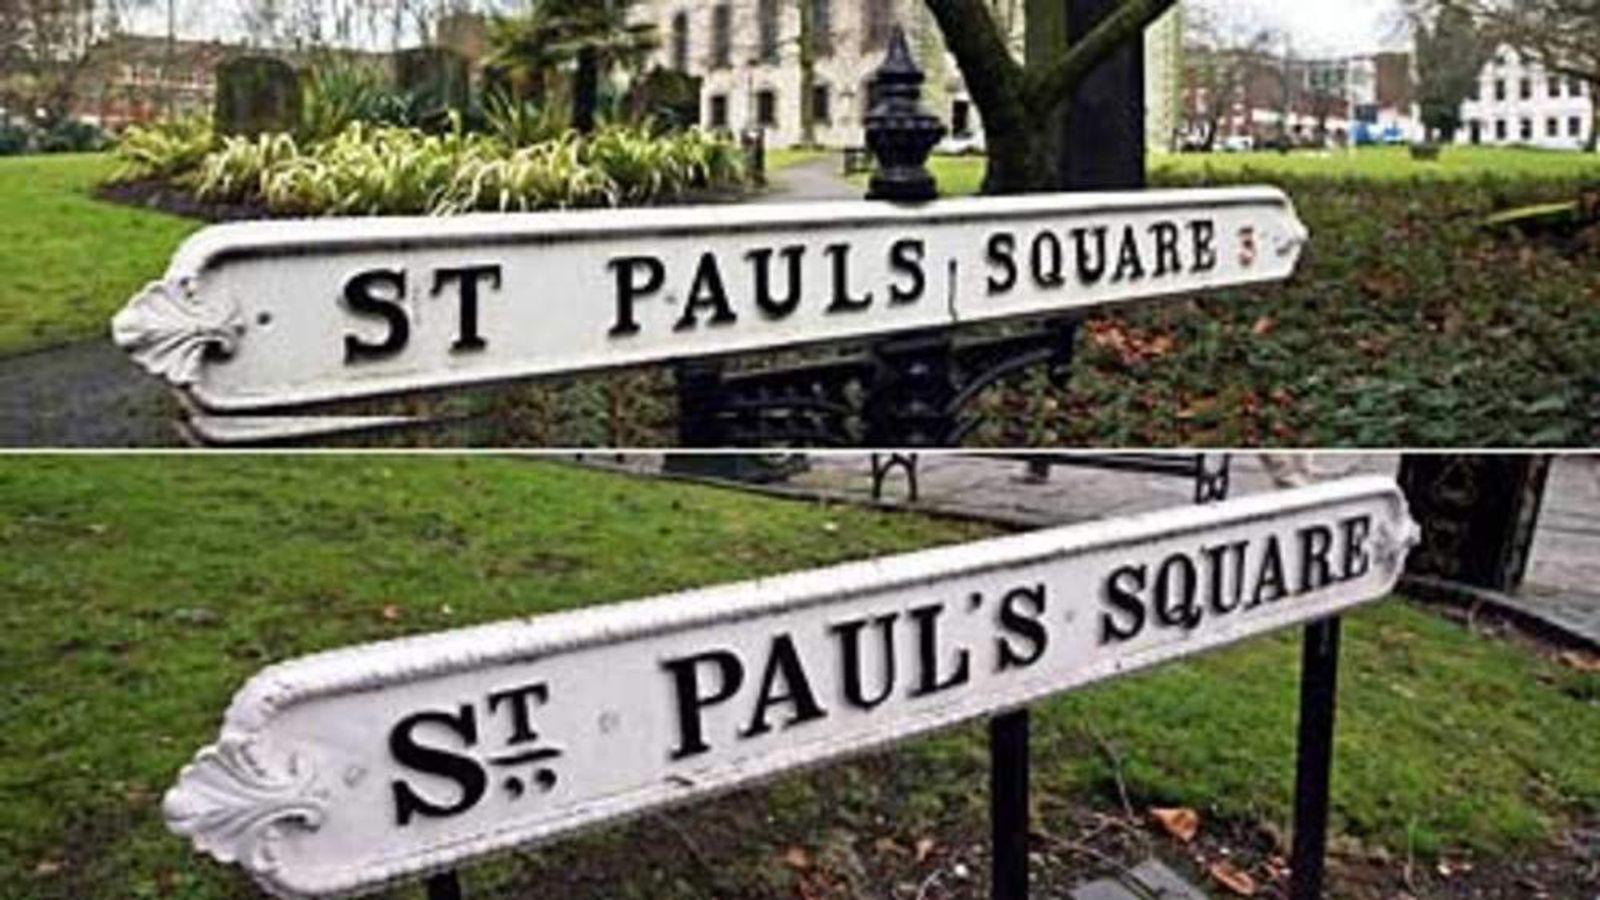 St. Paul's Square or St. Pauls Square in Birmingham